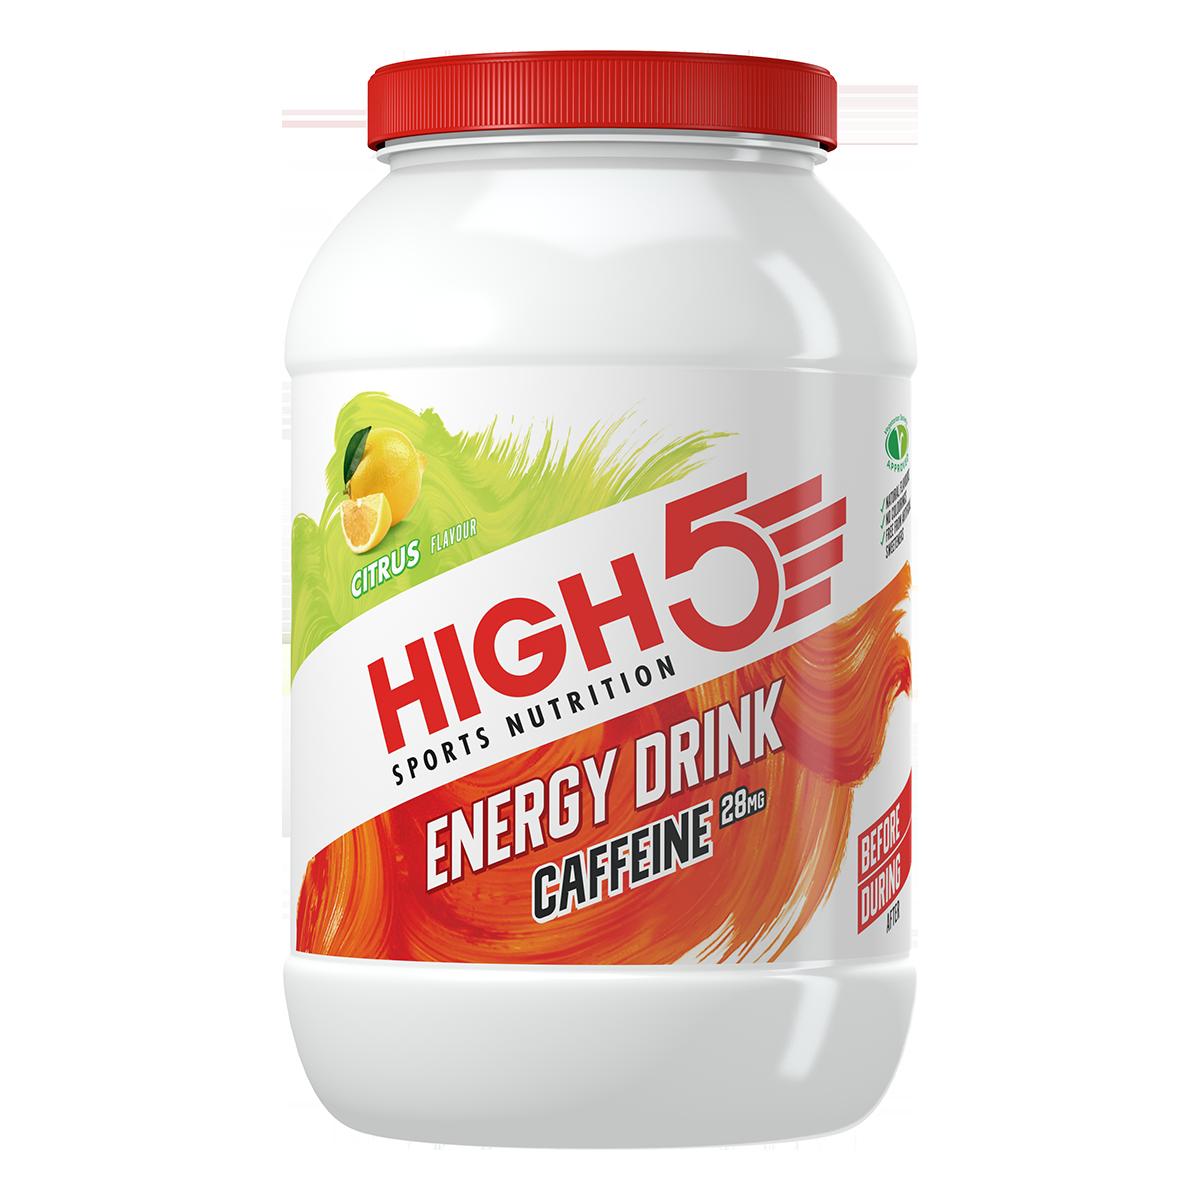 Energy-Drink-Caffeine_Citrus_2200g_Front_RGB_1200x1200